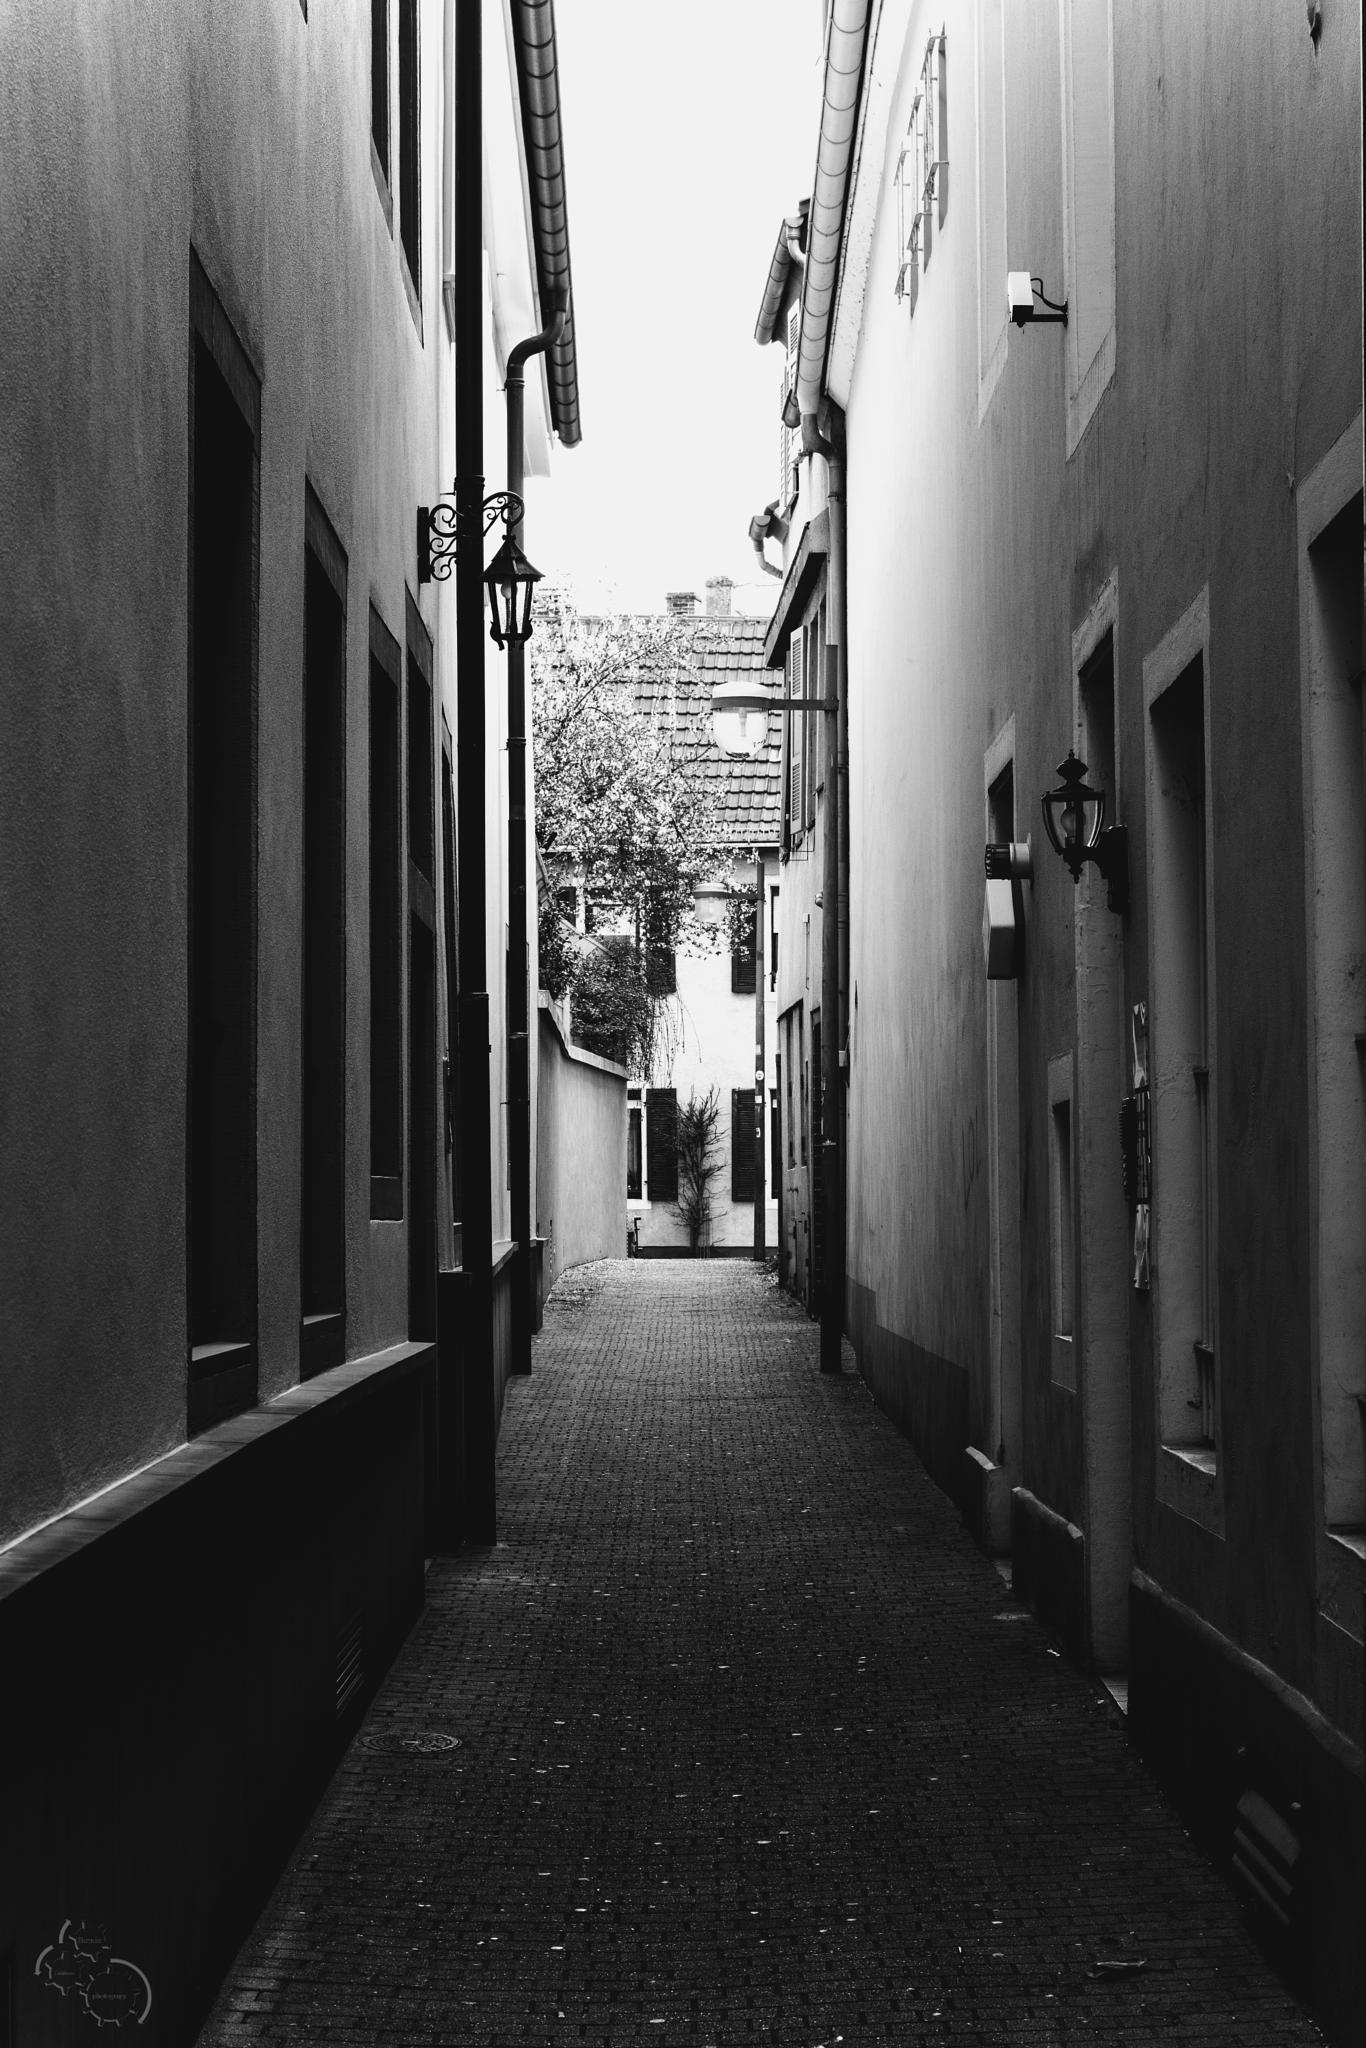 Gassen-Blick by Bernie Lamberz photography